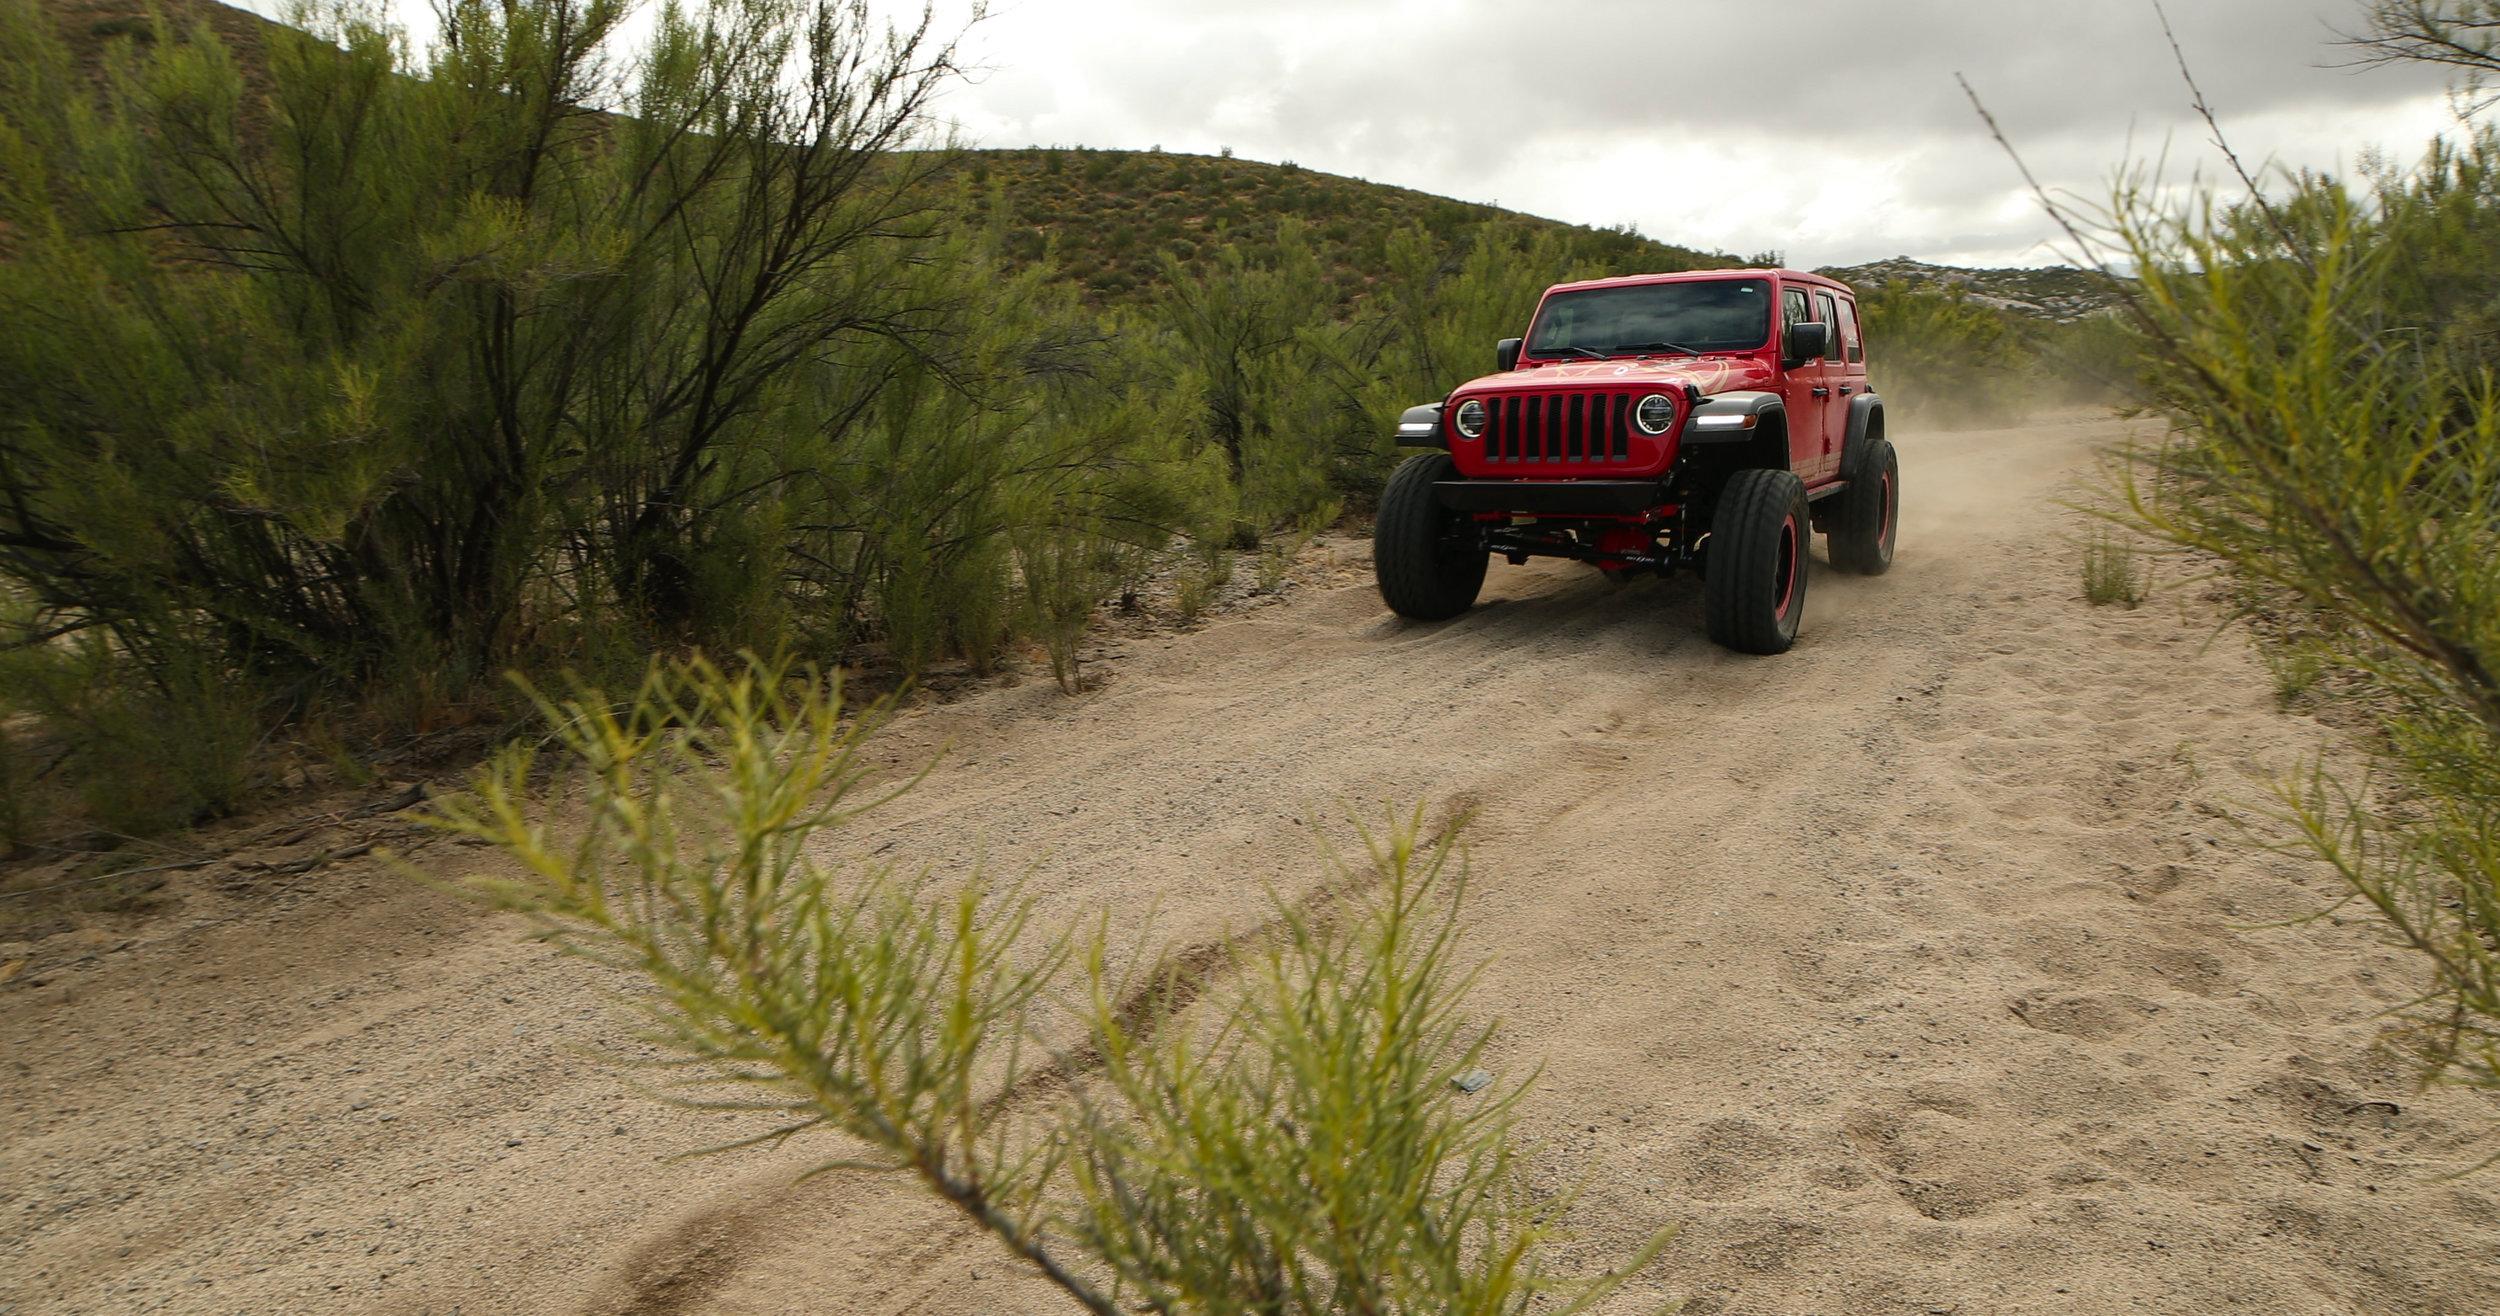 6_24_CaseyCurrie_Baja500PreRunning_BajaMexico_Jeep_014.jpg